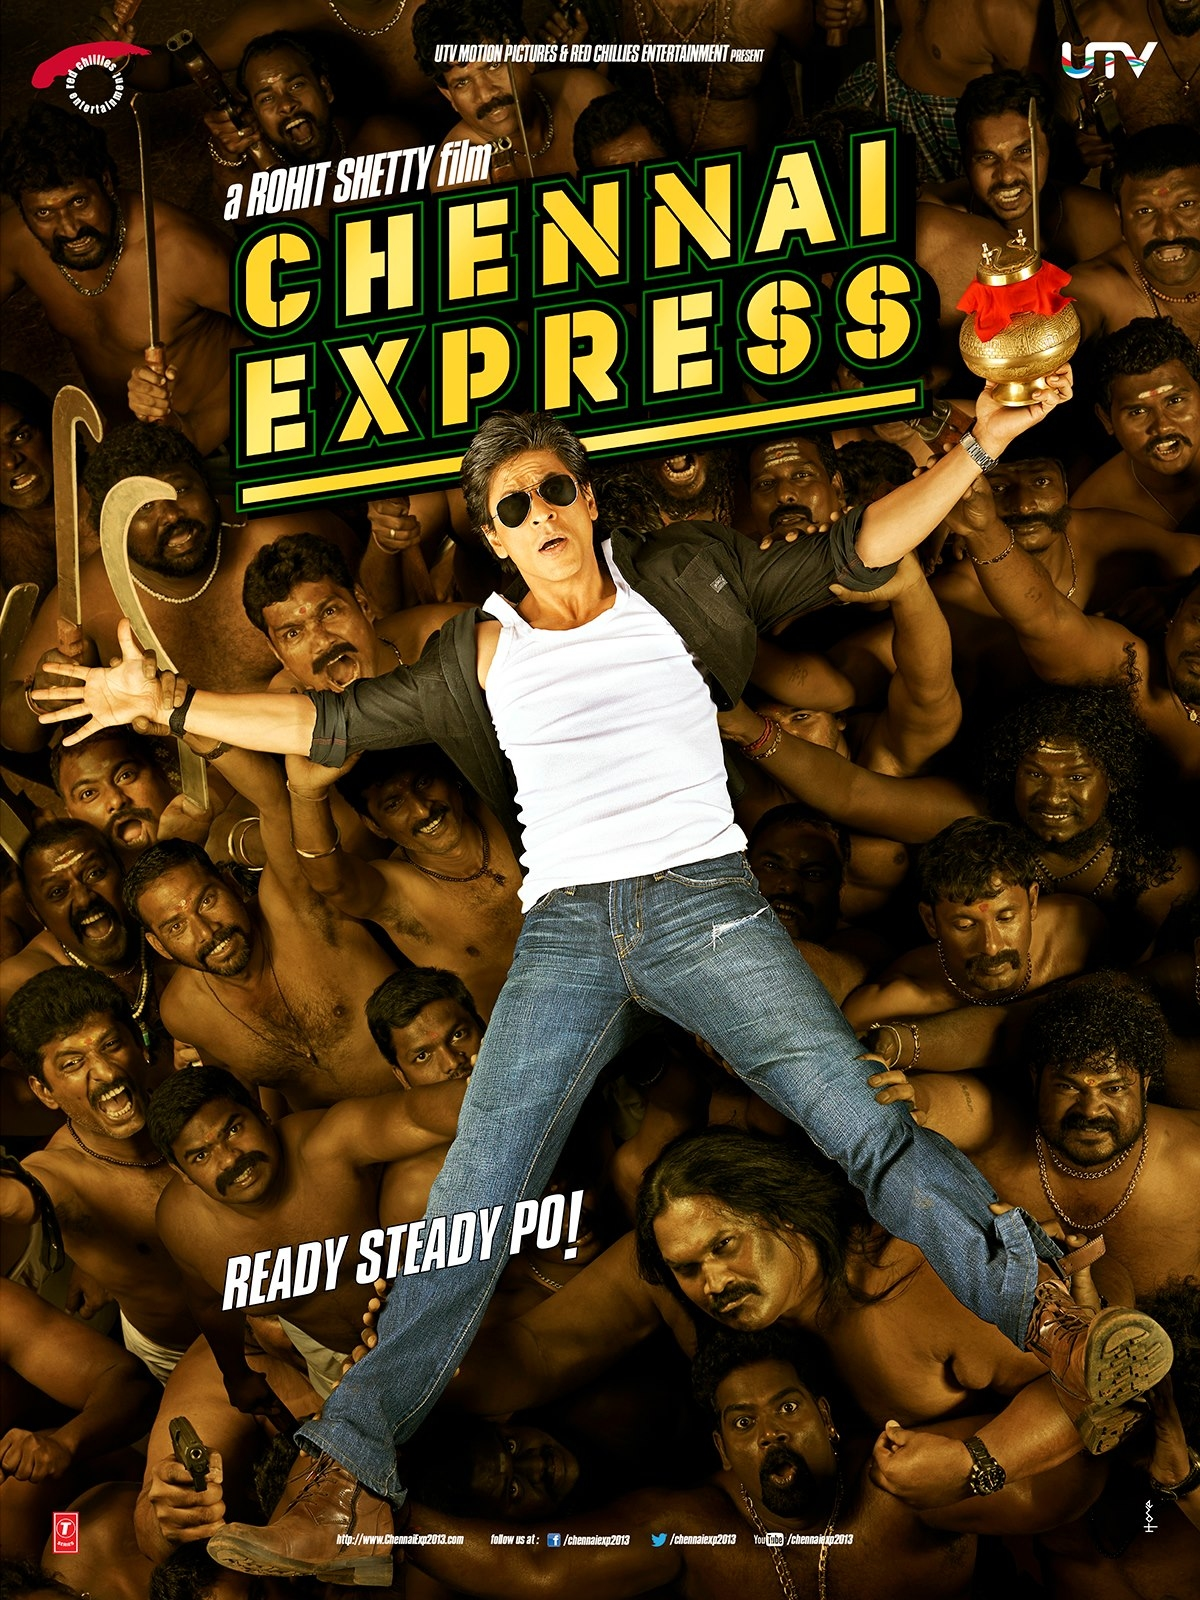 Chennai Express - Movie Poster #2 (Original)